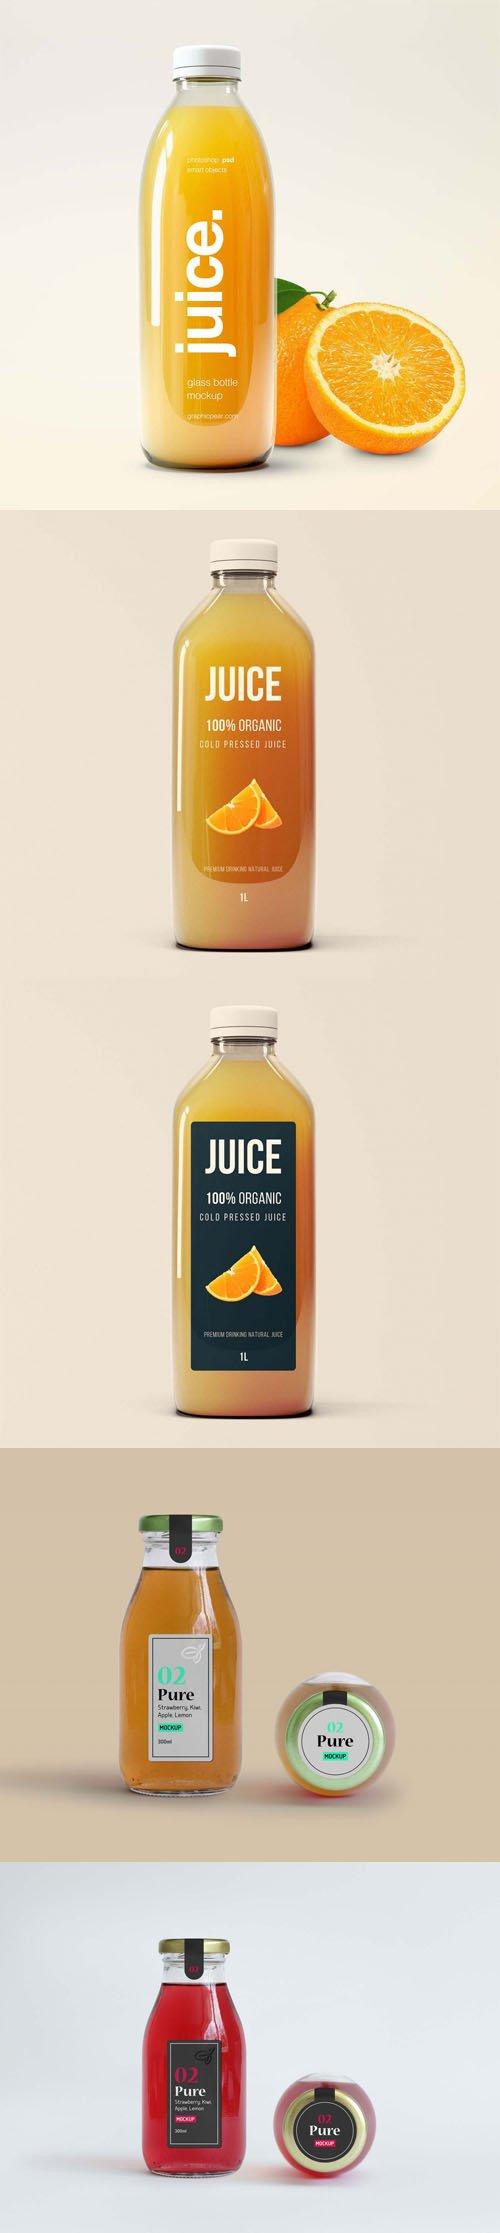 Transparent Glass Juice Bottles PSD Mockups Templates Collection